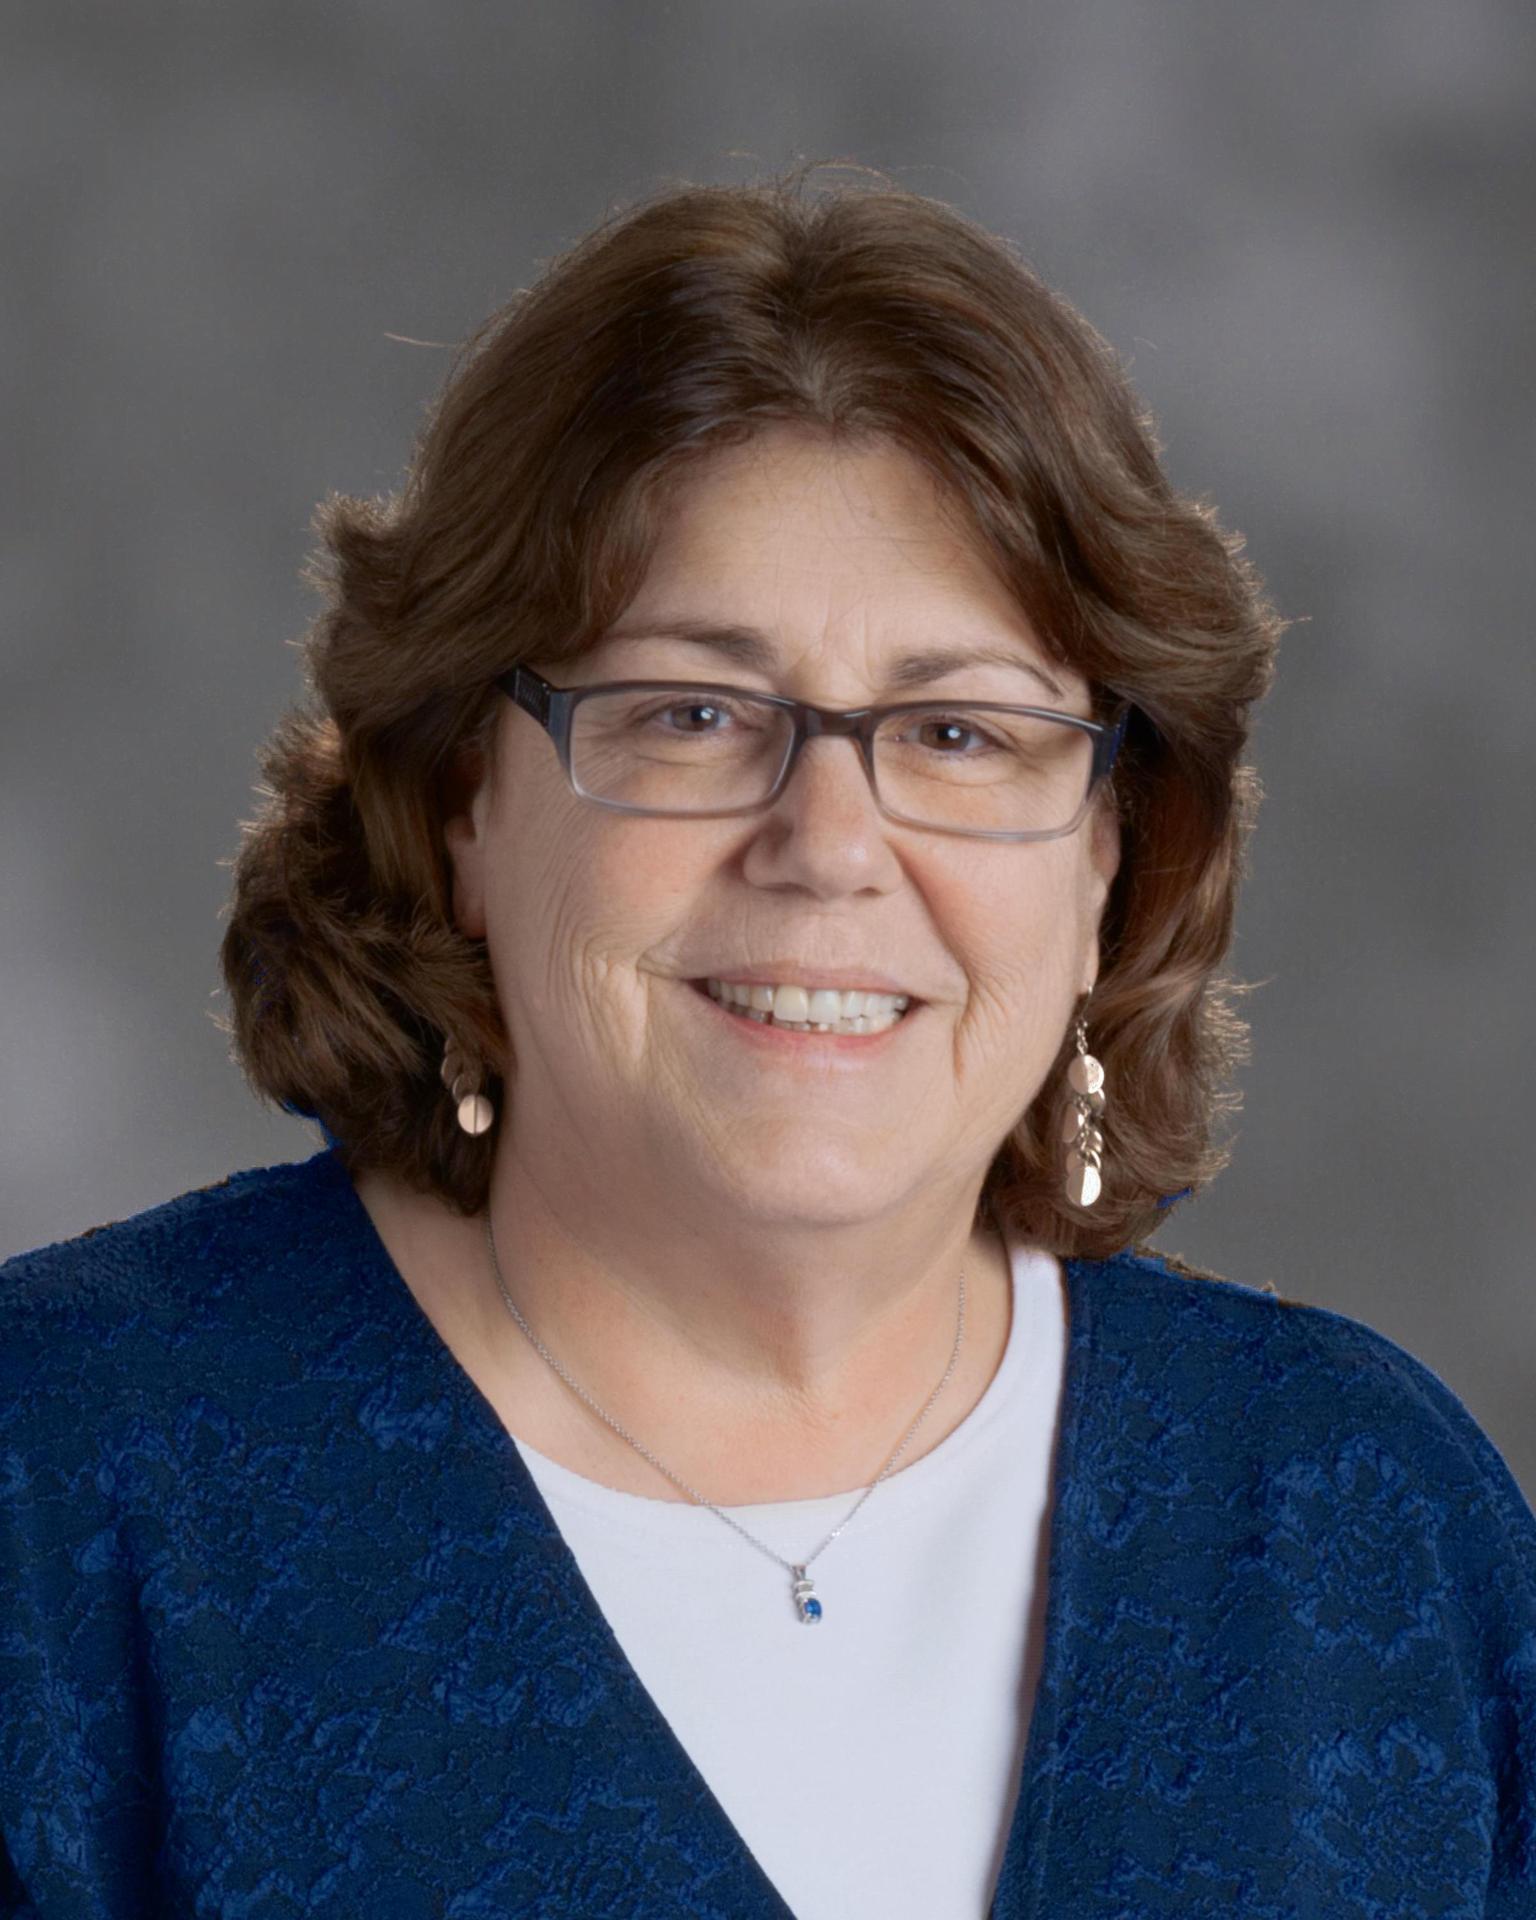 Sharon Lampel